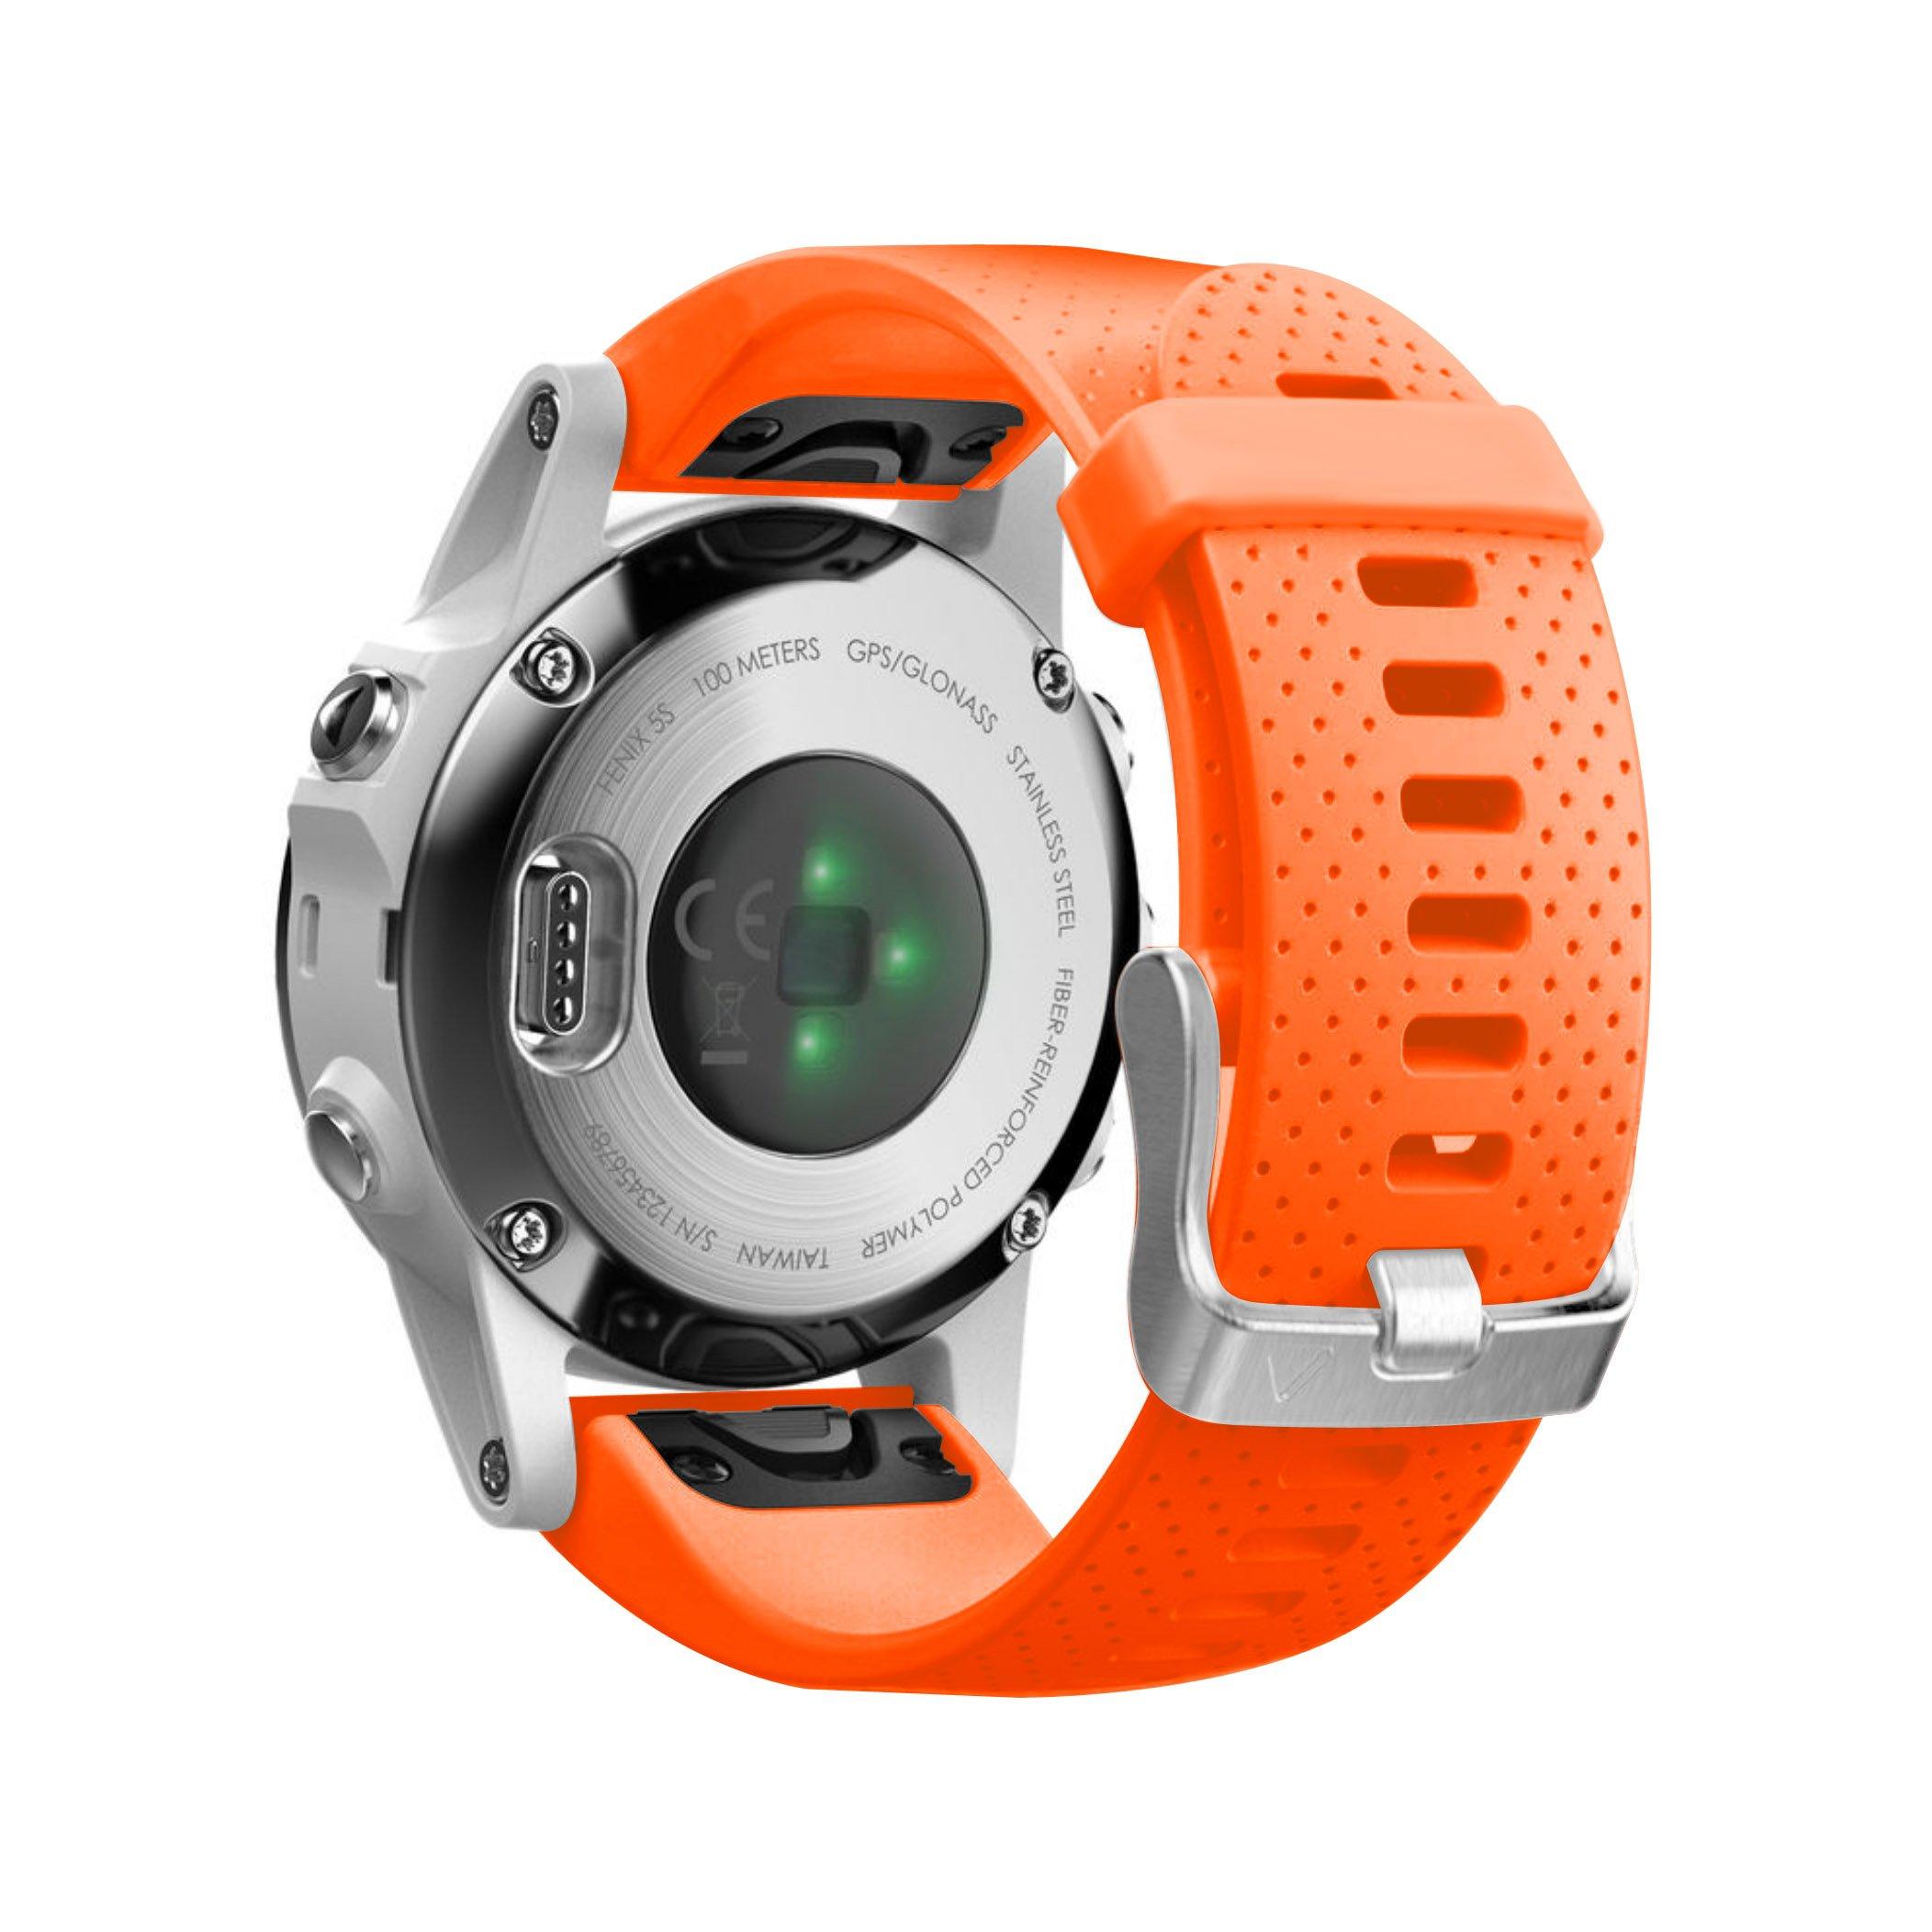 NotoCity Compatible Fenix 5S Watch Band Easy Fit Soft Silicone 20mm Replacement Watch Strap for Fenix 5S / 5S Plus/Fenix 6S/Fenix 6S Pro/D2 Delta S Smartwatch(Silver Buckle-Orange)